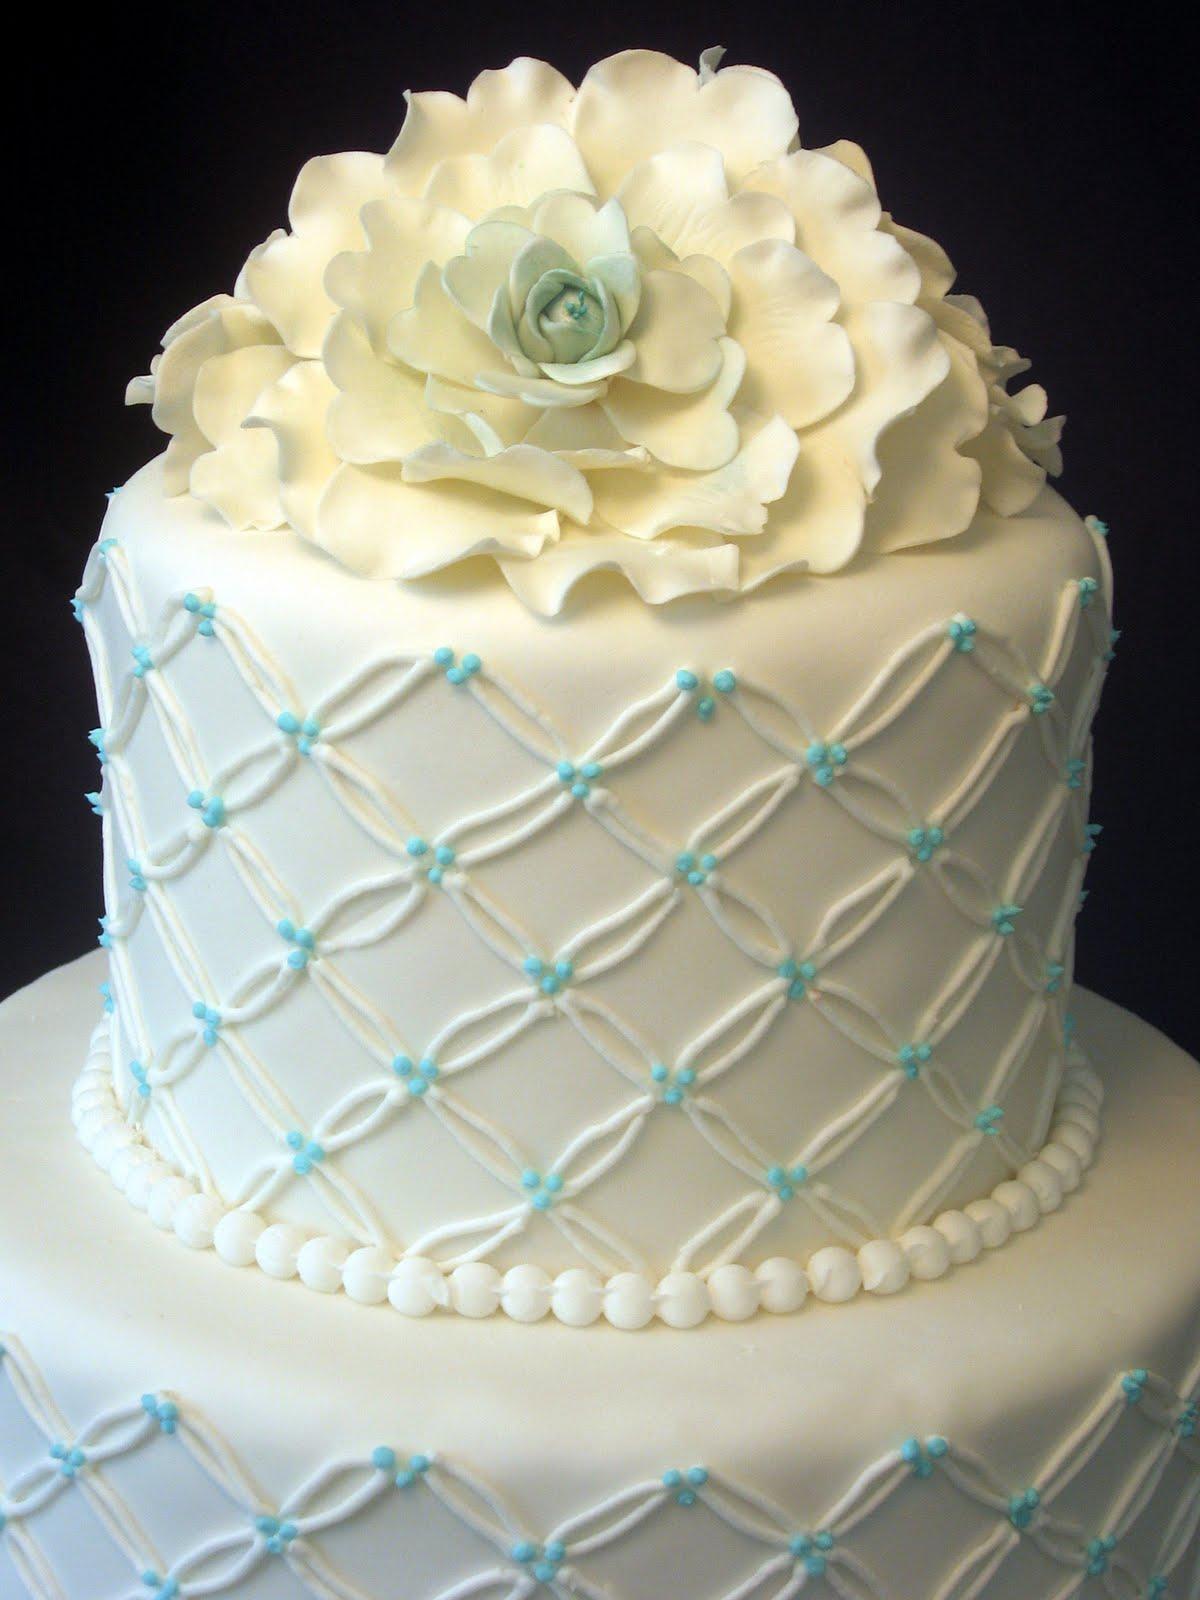 Cake Fiction Camellia Wedding Cake with Cross Hatching